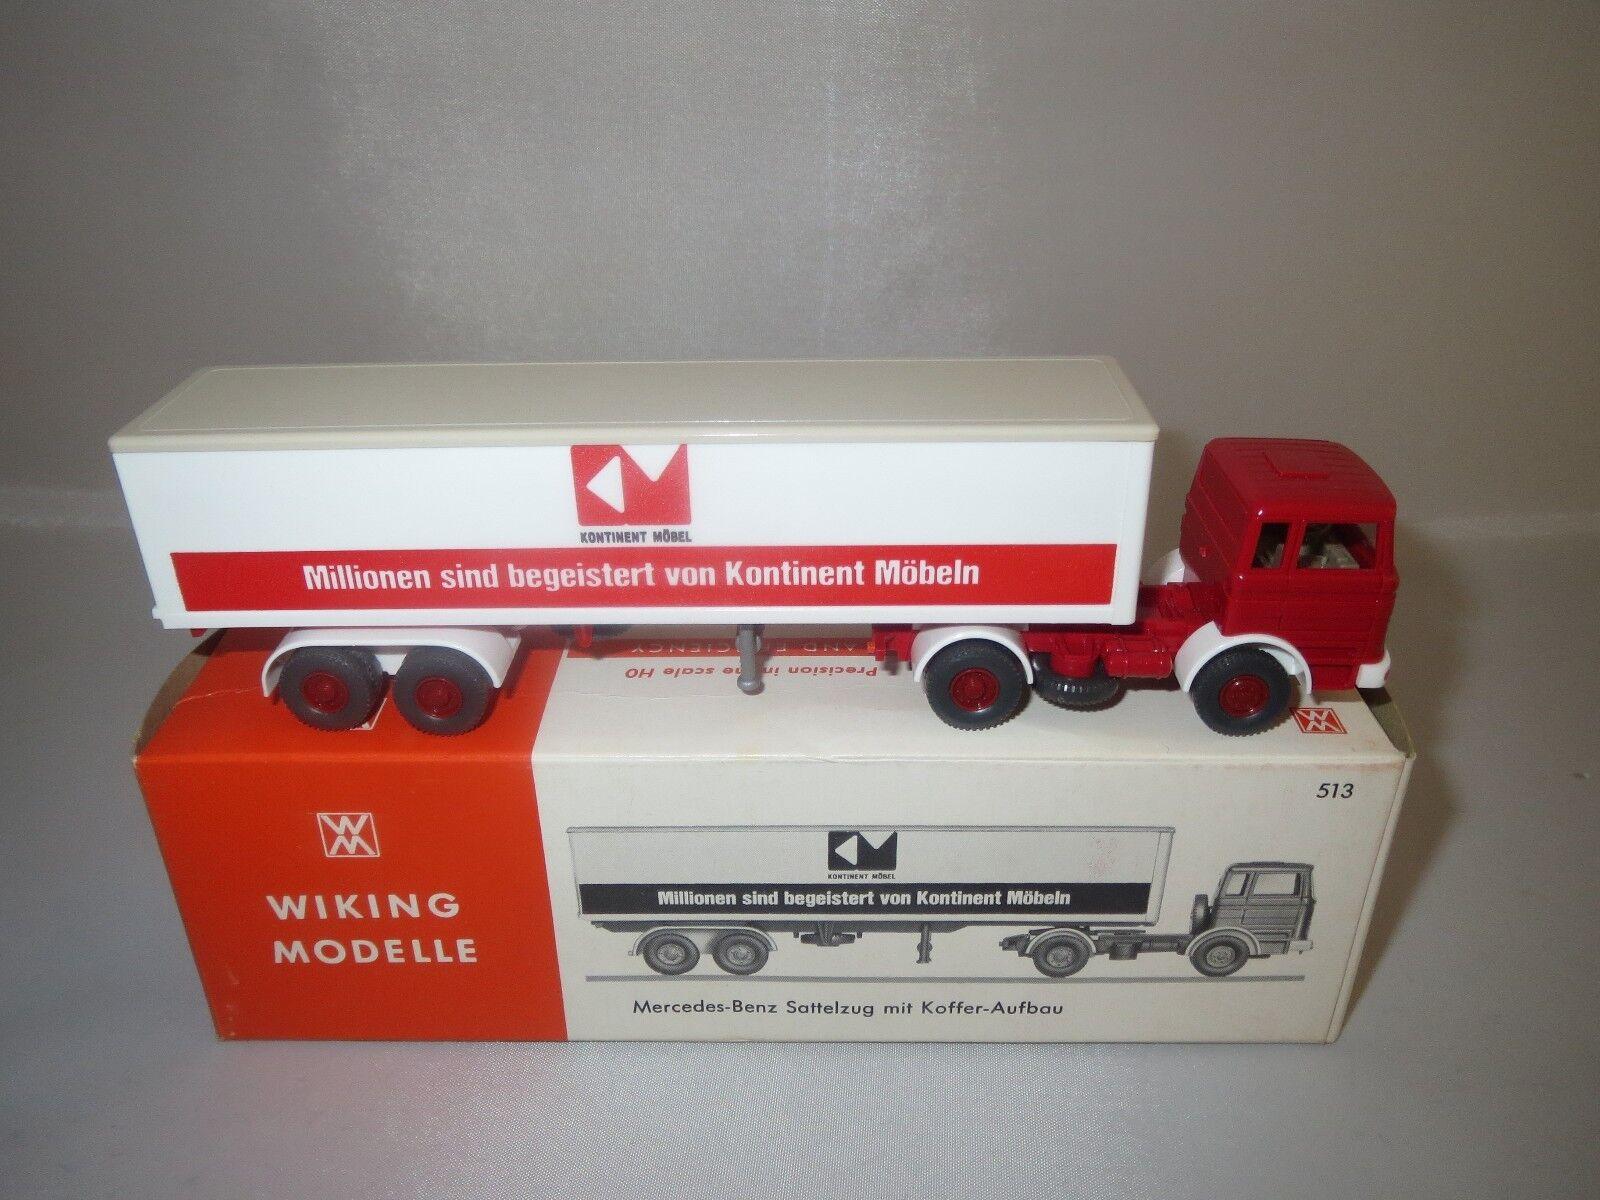 Wiking 513 MERCEDES-BENZ SEMI-REMORQUE avec valise-construction 1 87 Neuf dans sa boîte